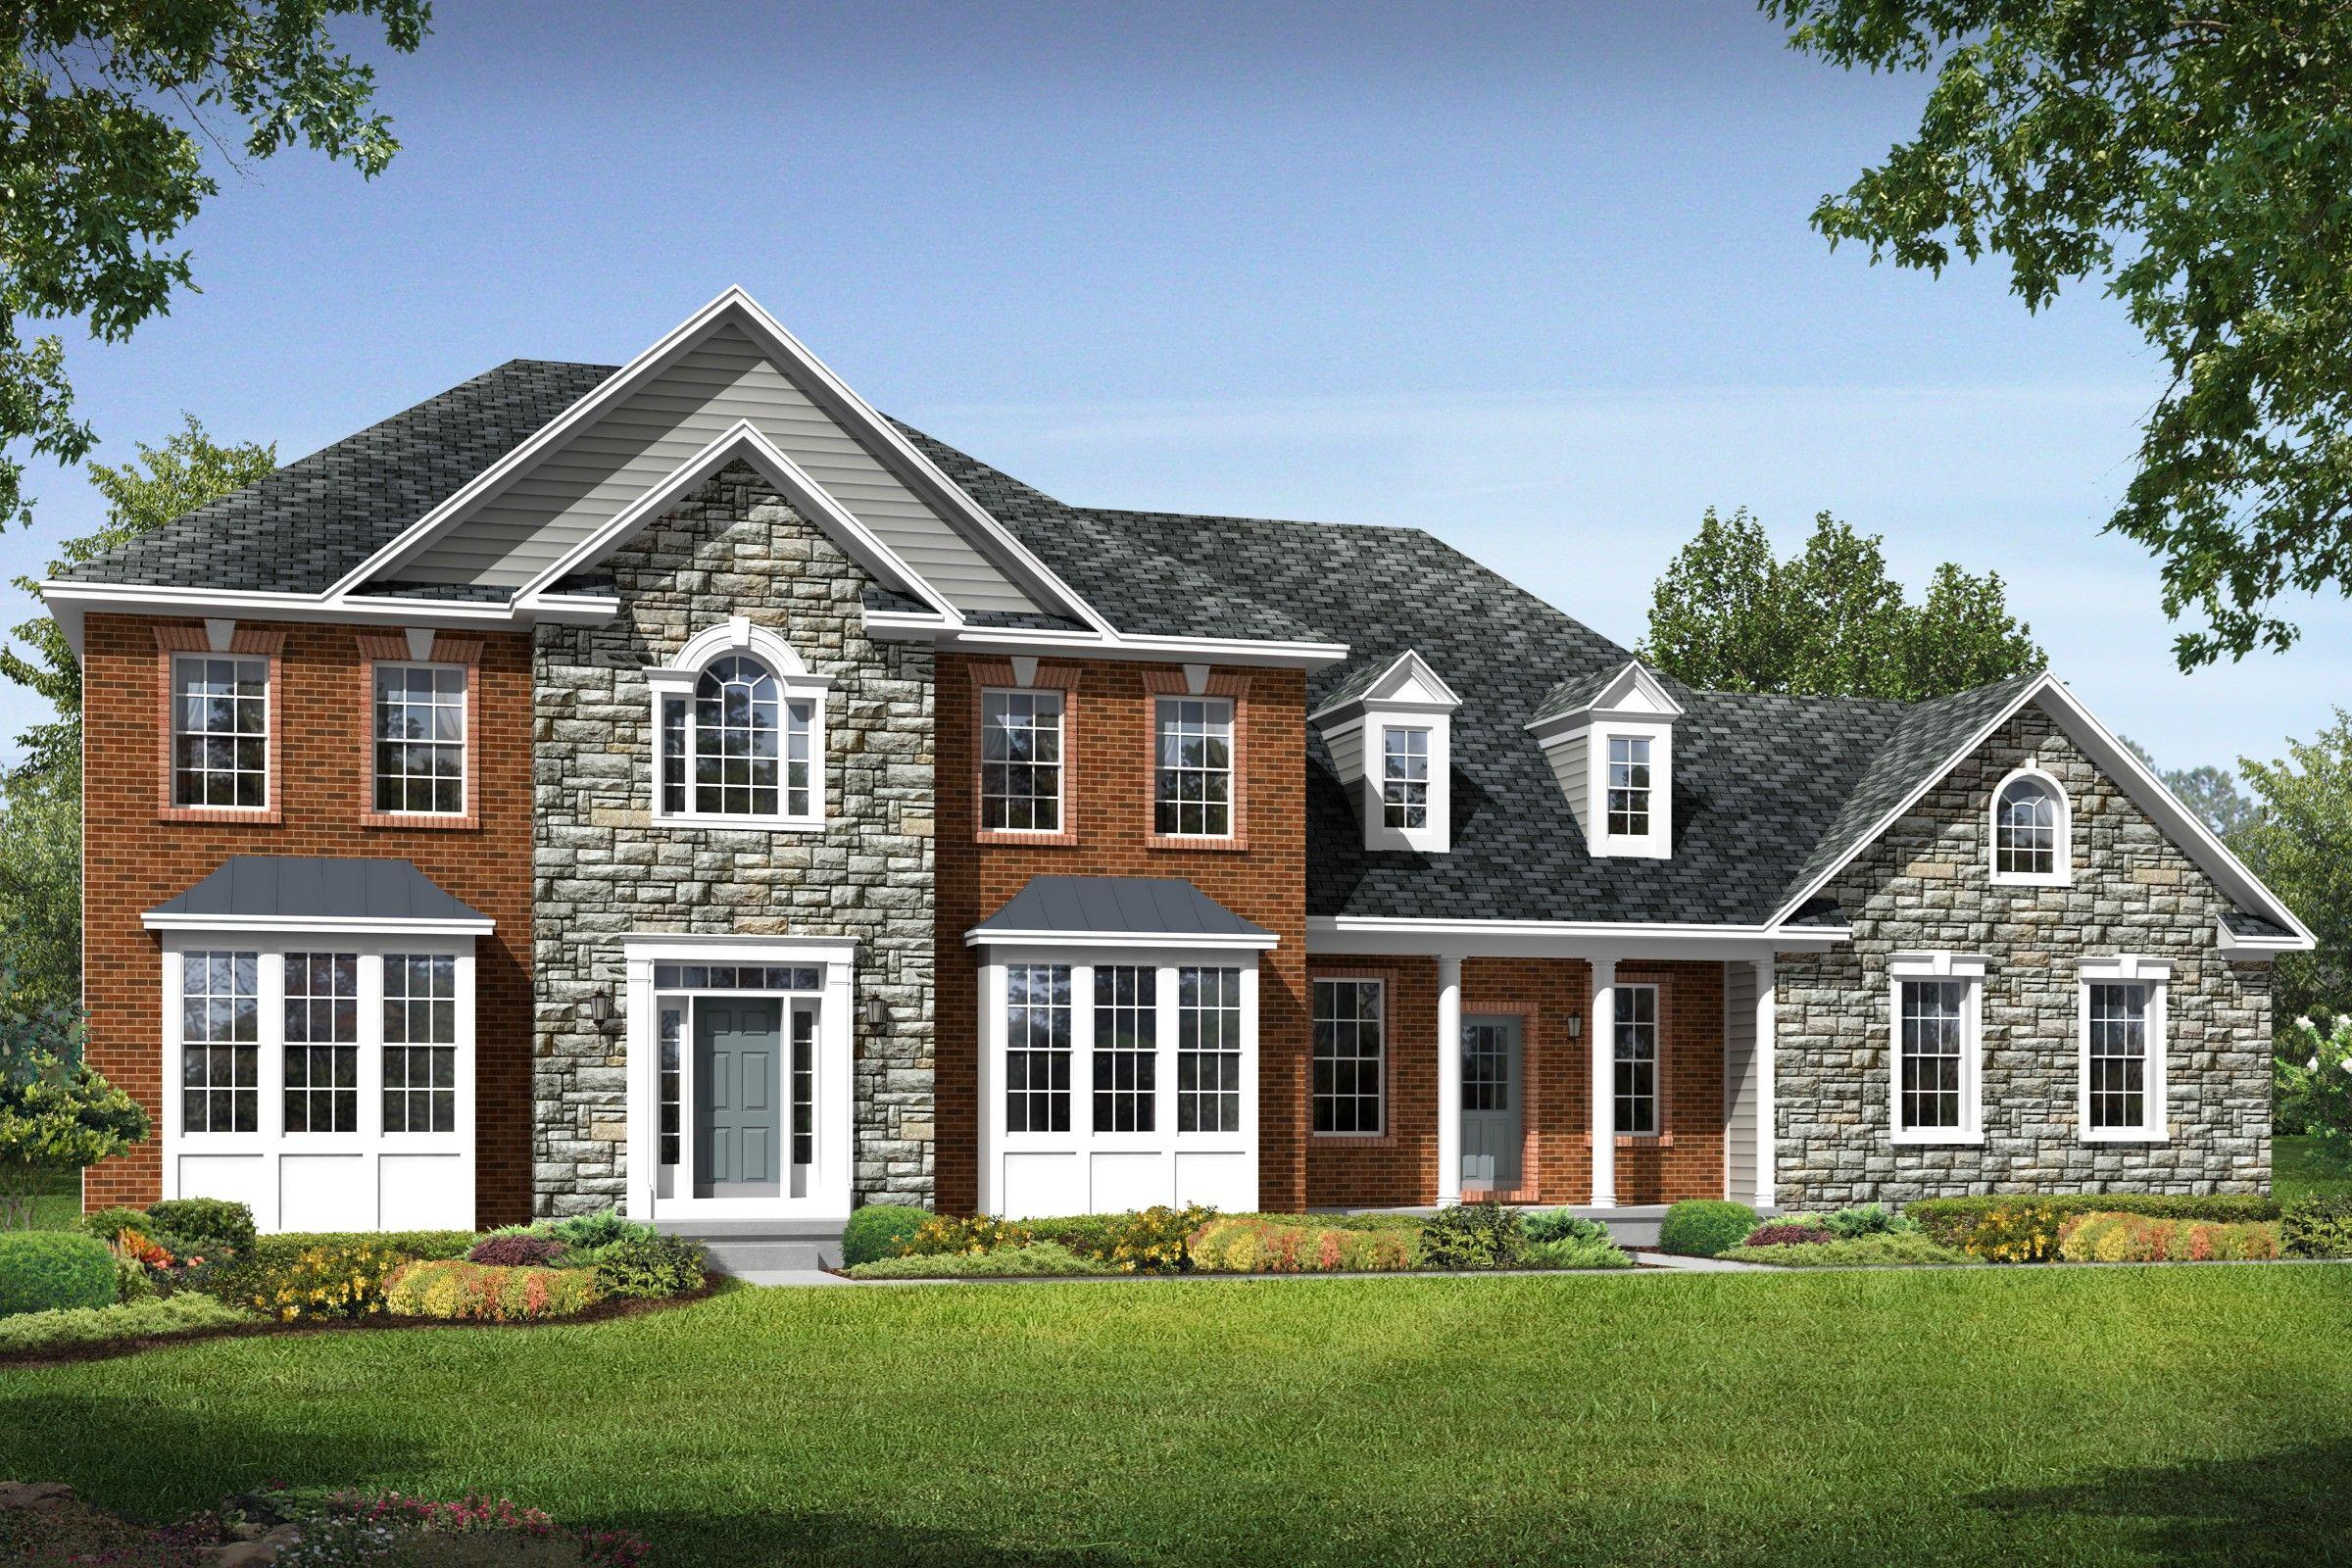 K Hovnanian R Homes Reserves At Wheatlands Truman